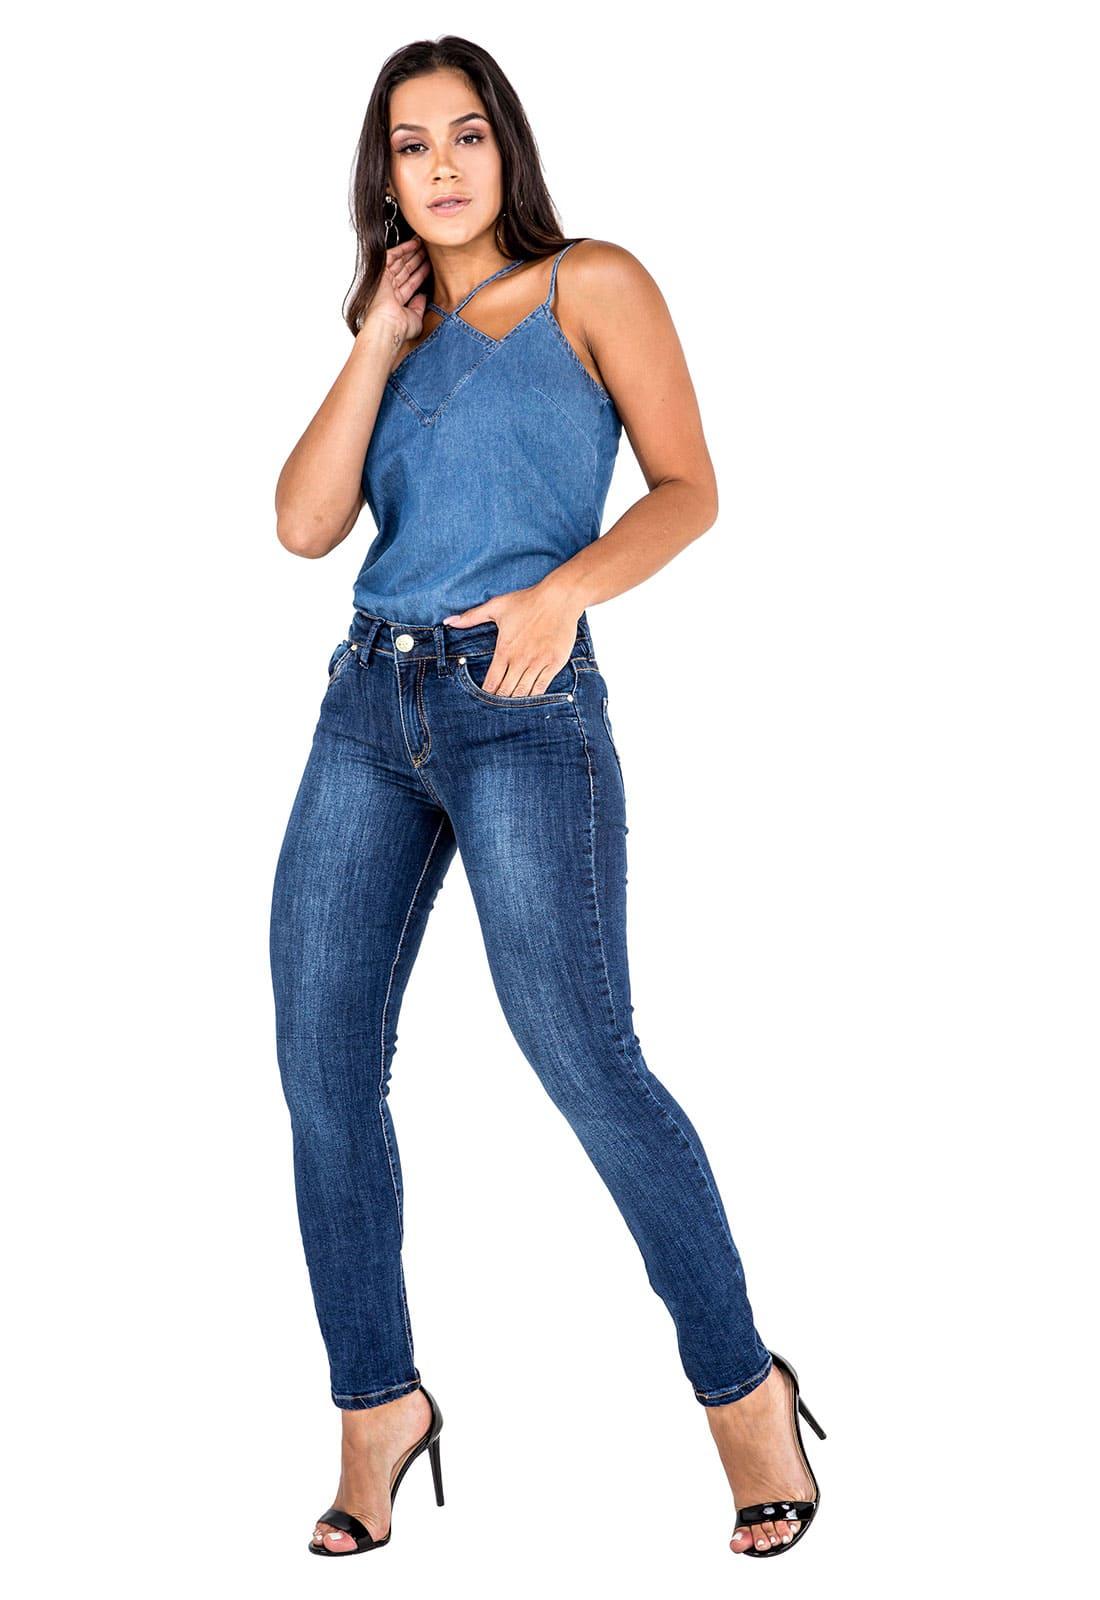 Calça jeans Feminina Skinny Tradicional